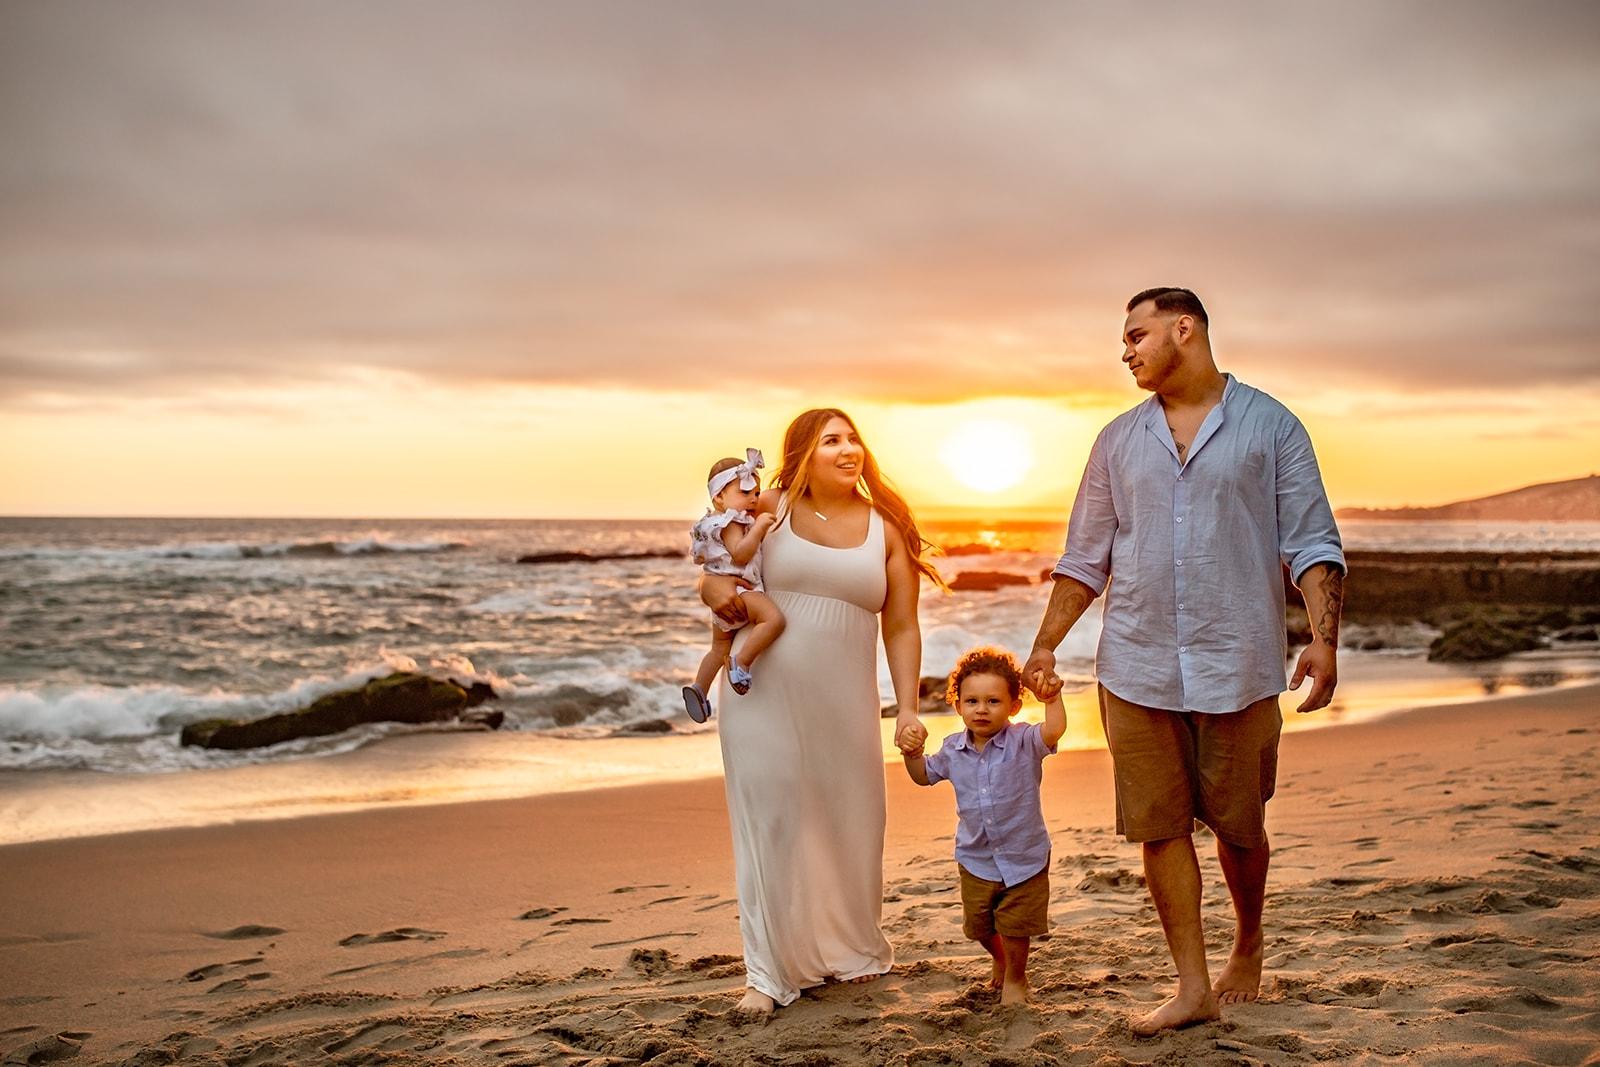 Family photo at Victoria Beach in Orange County